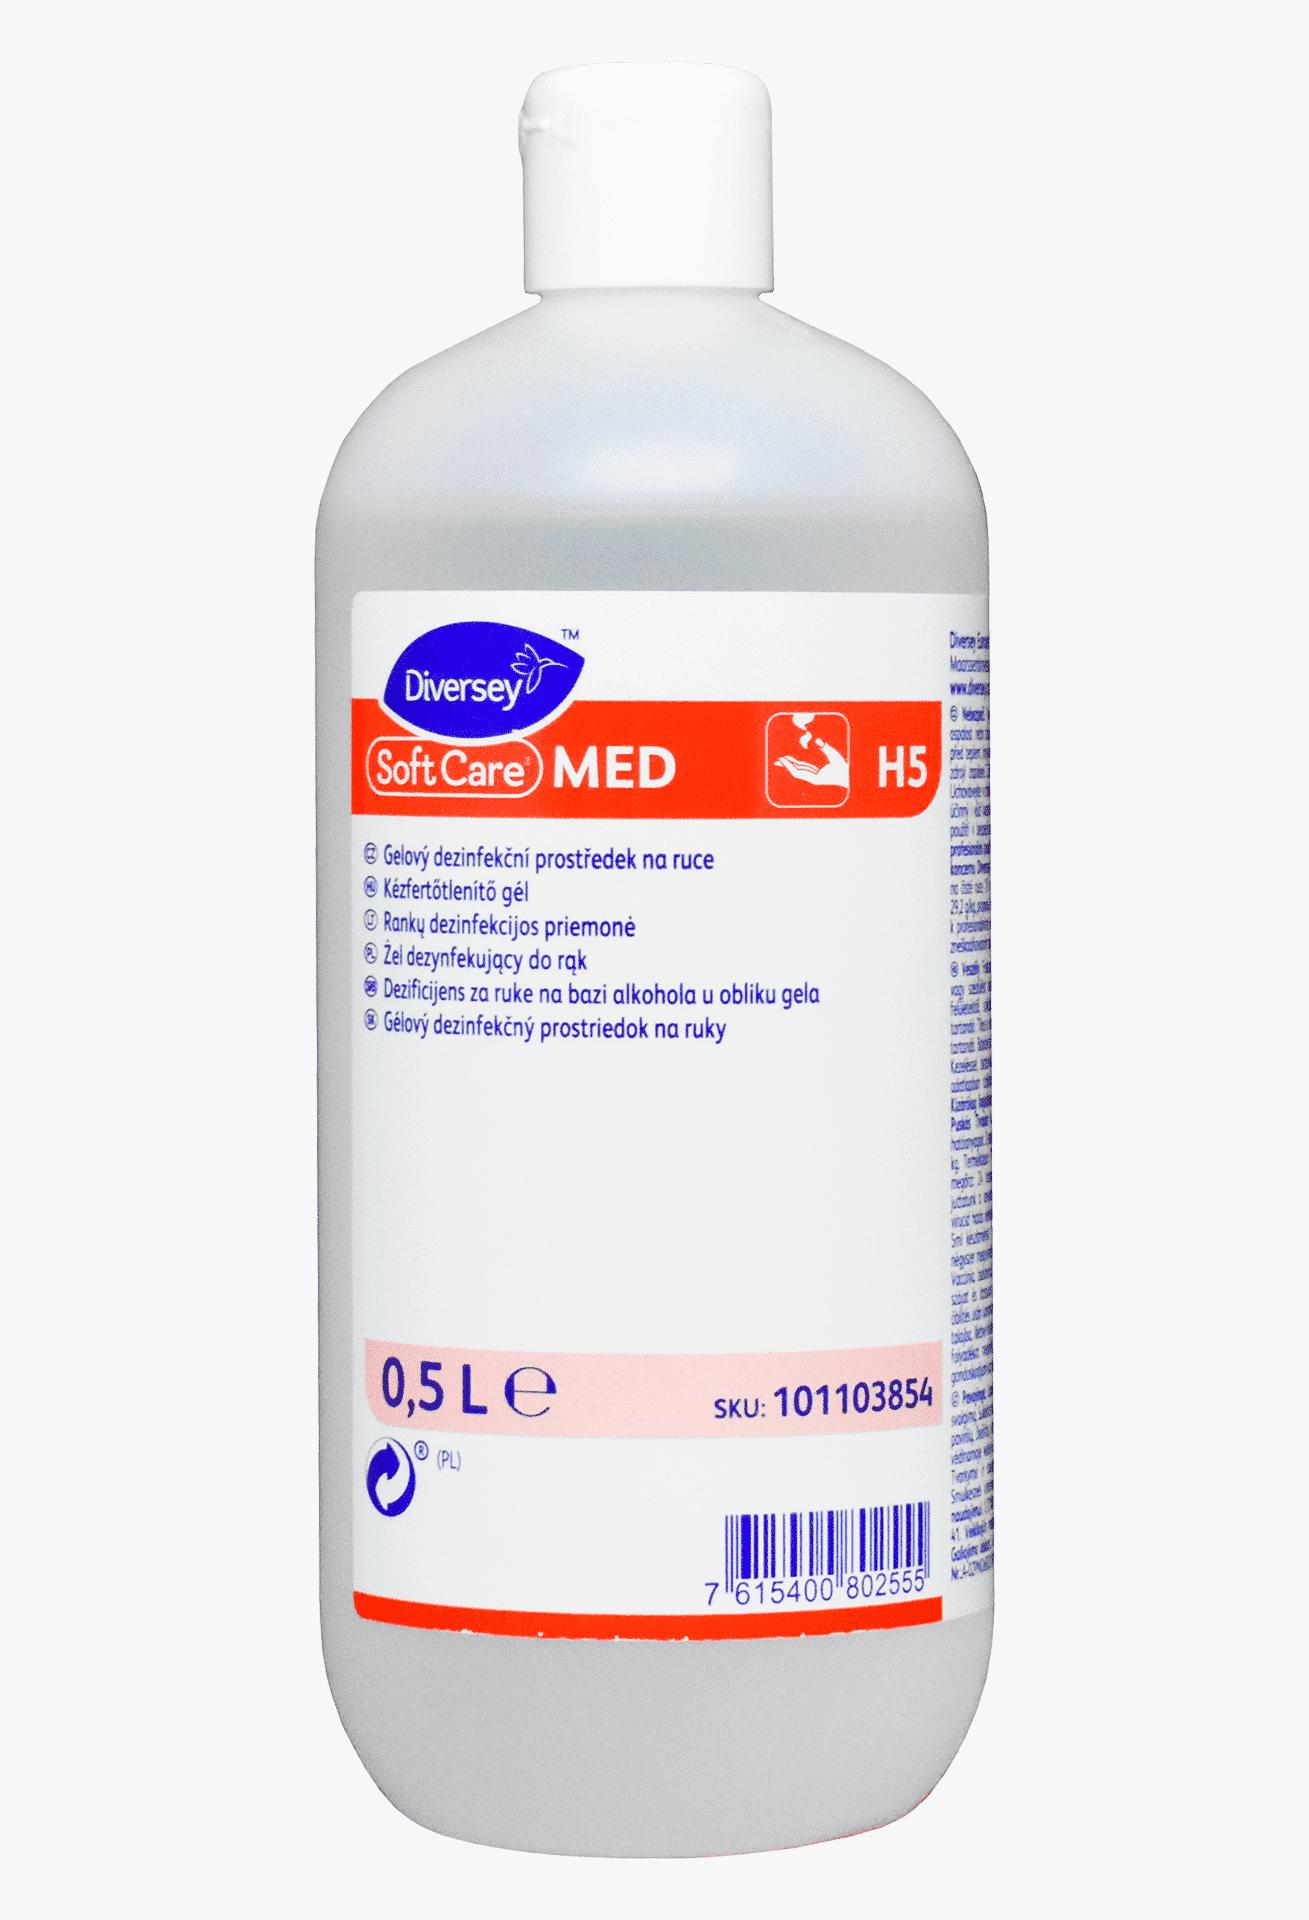 Soft Care Med – засіб для дезінфекції рук, 500мл